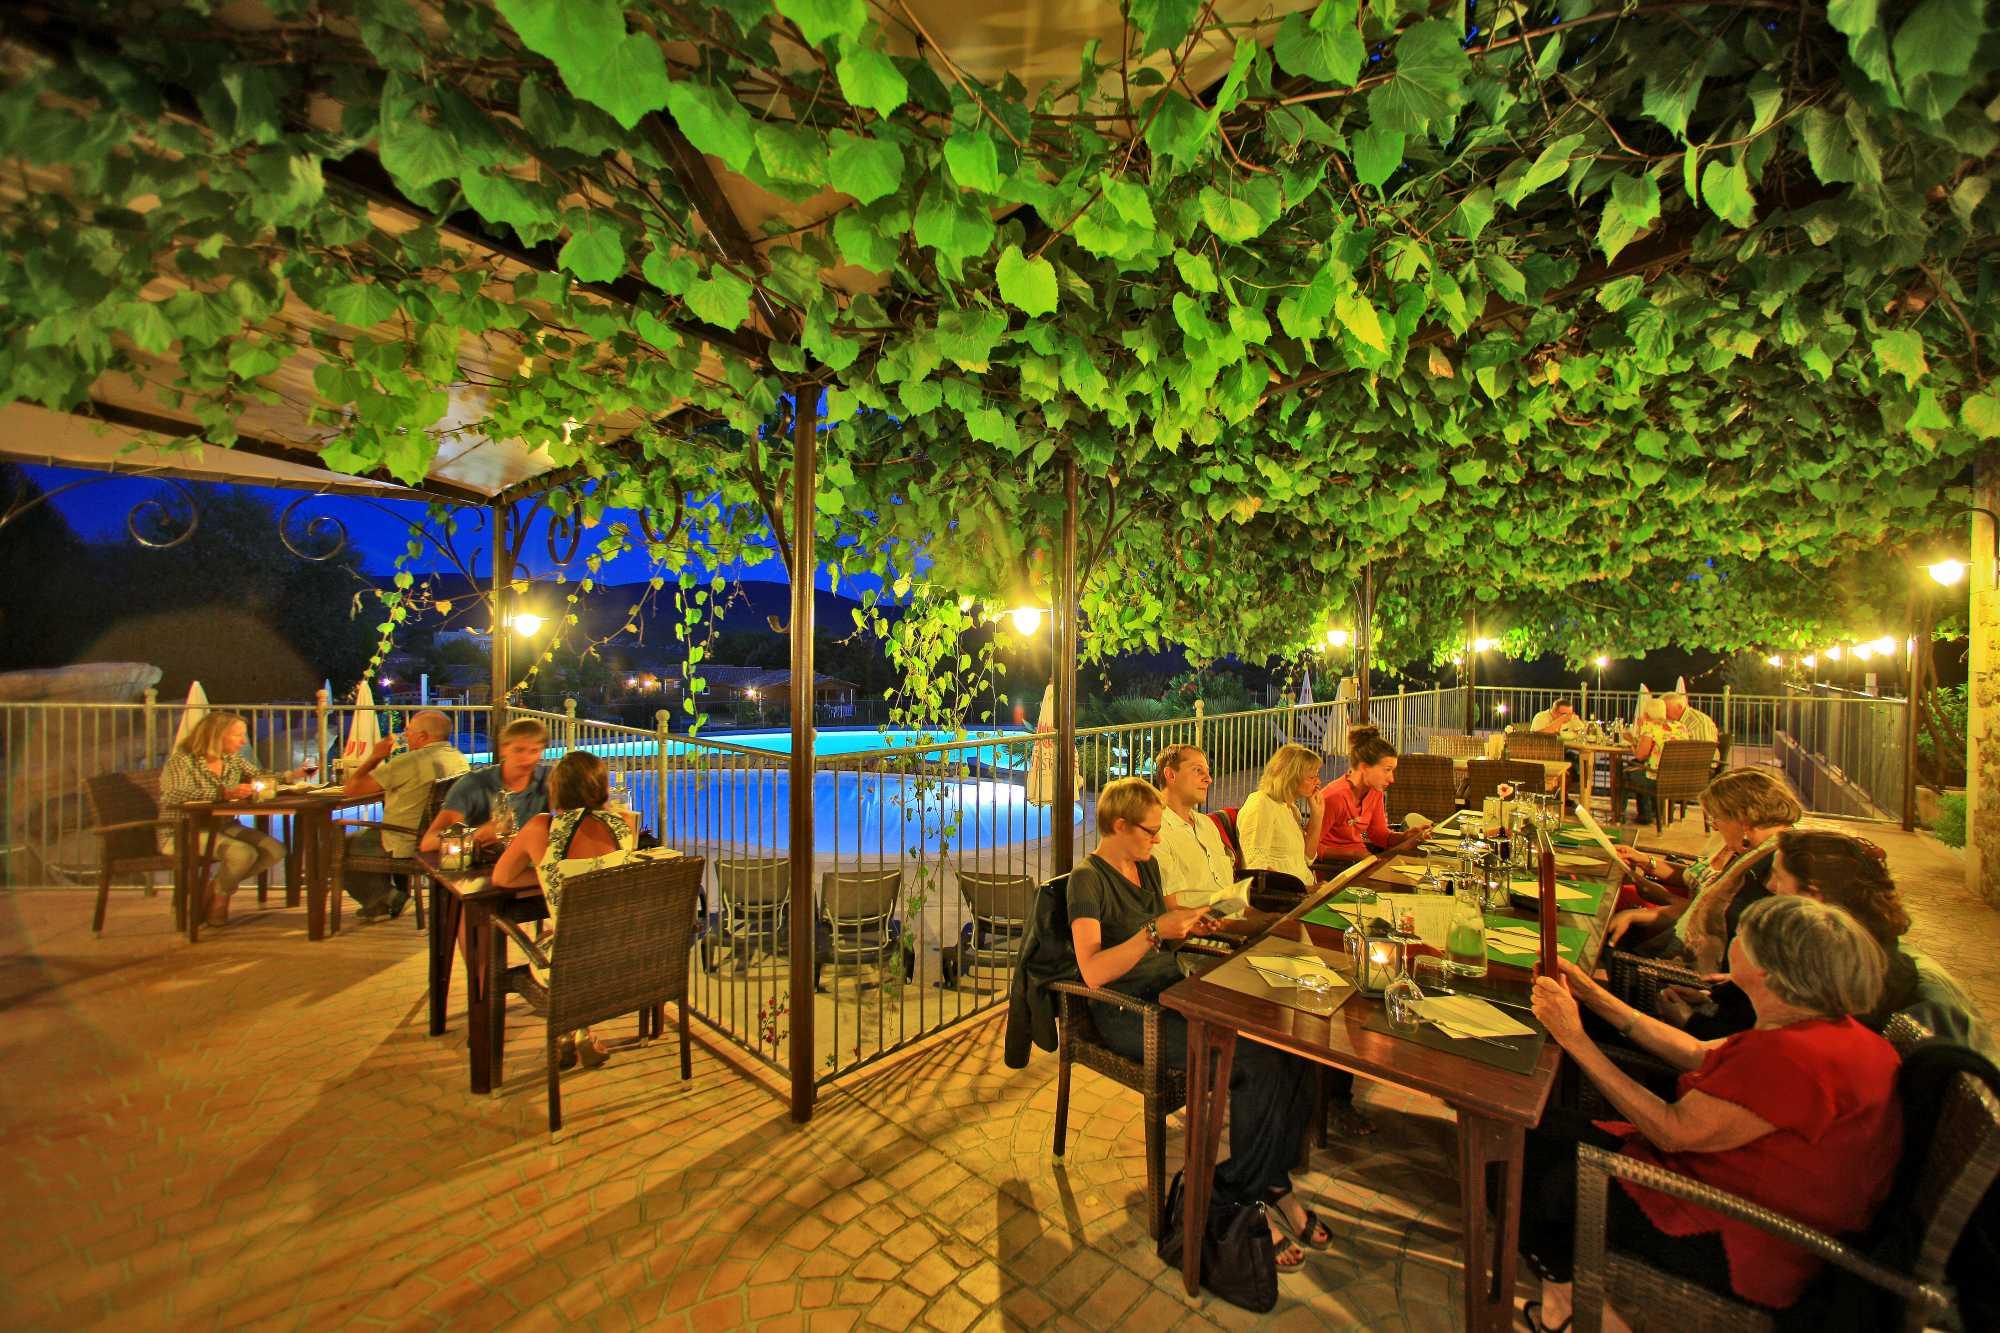 domaine sevenier camping 5 etoiles ardeche restaurant galerie photo3 - domaine-sevenier-camping-5-etoiles-ardeche-restaurant-galerie-photo3